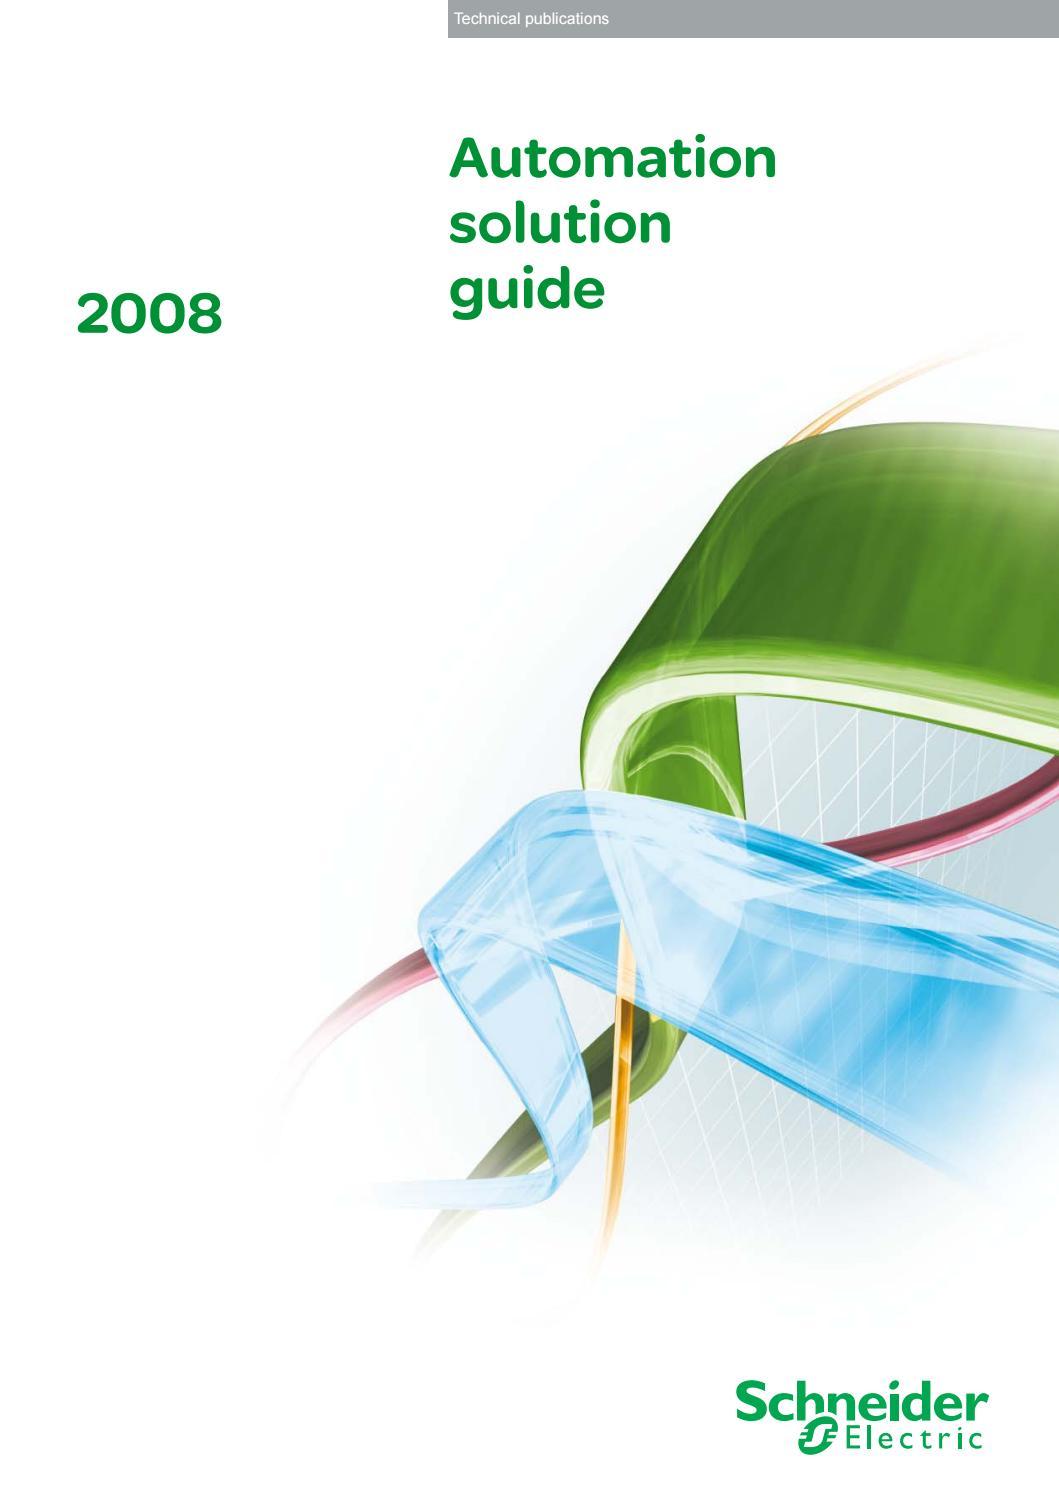 Automation solution guide 2008 en by jomisone - issuu